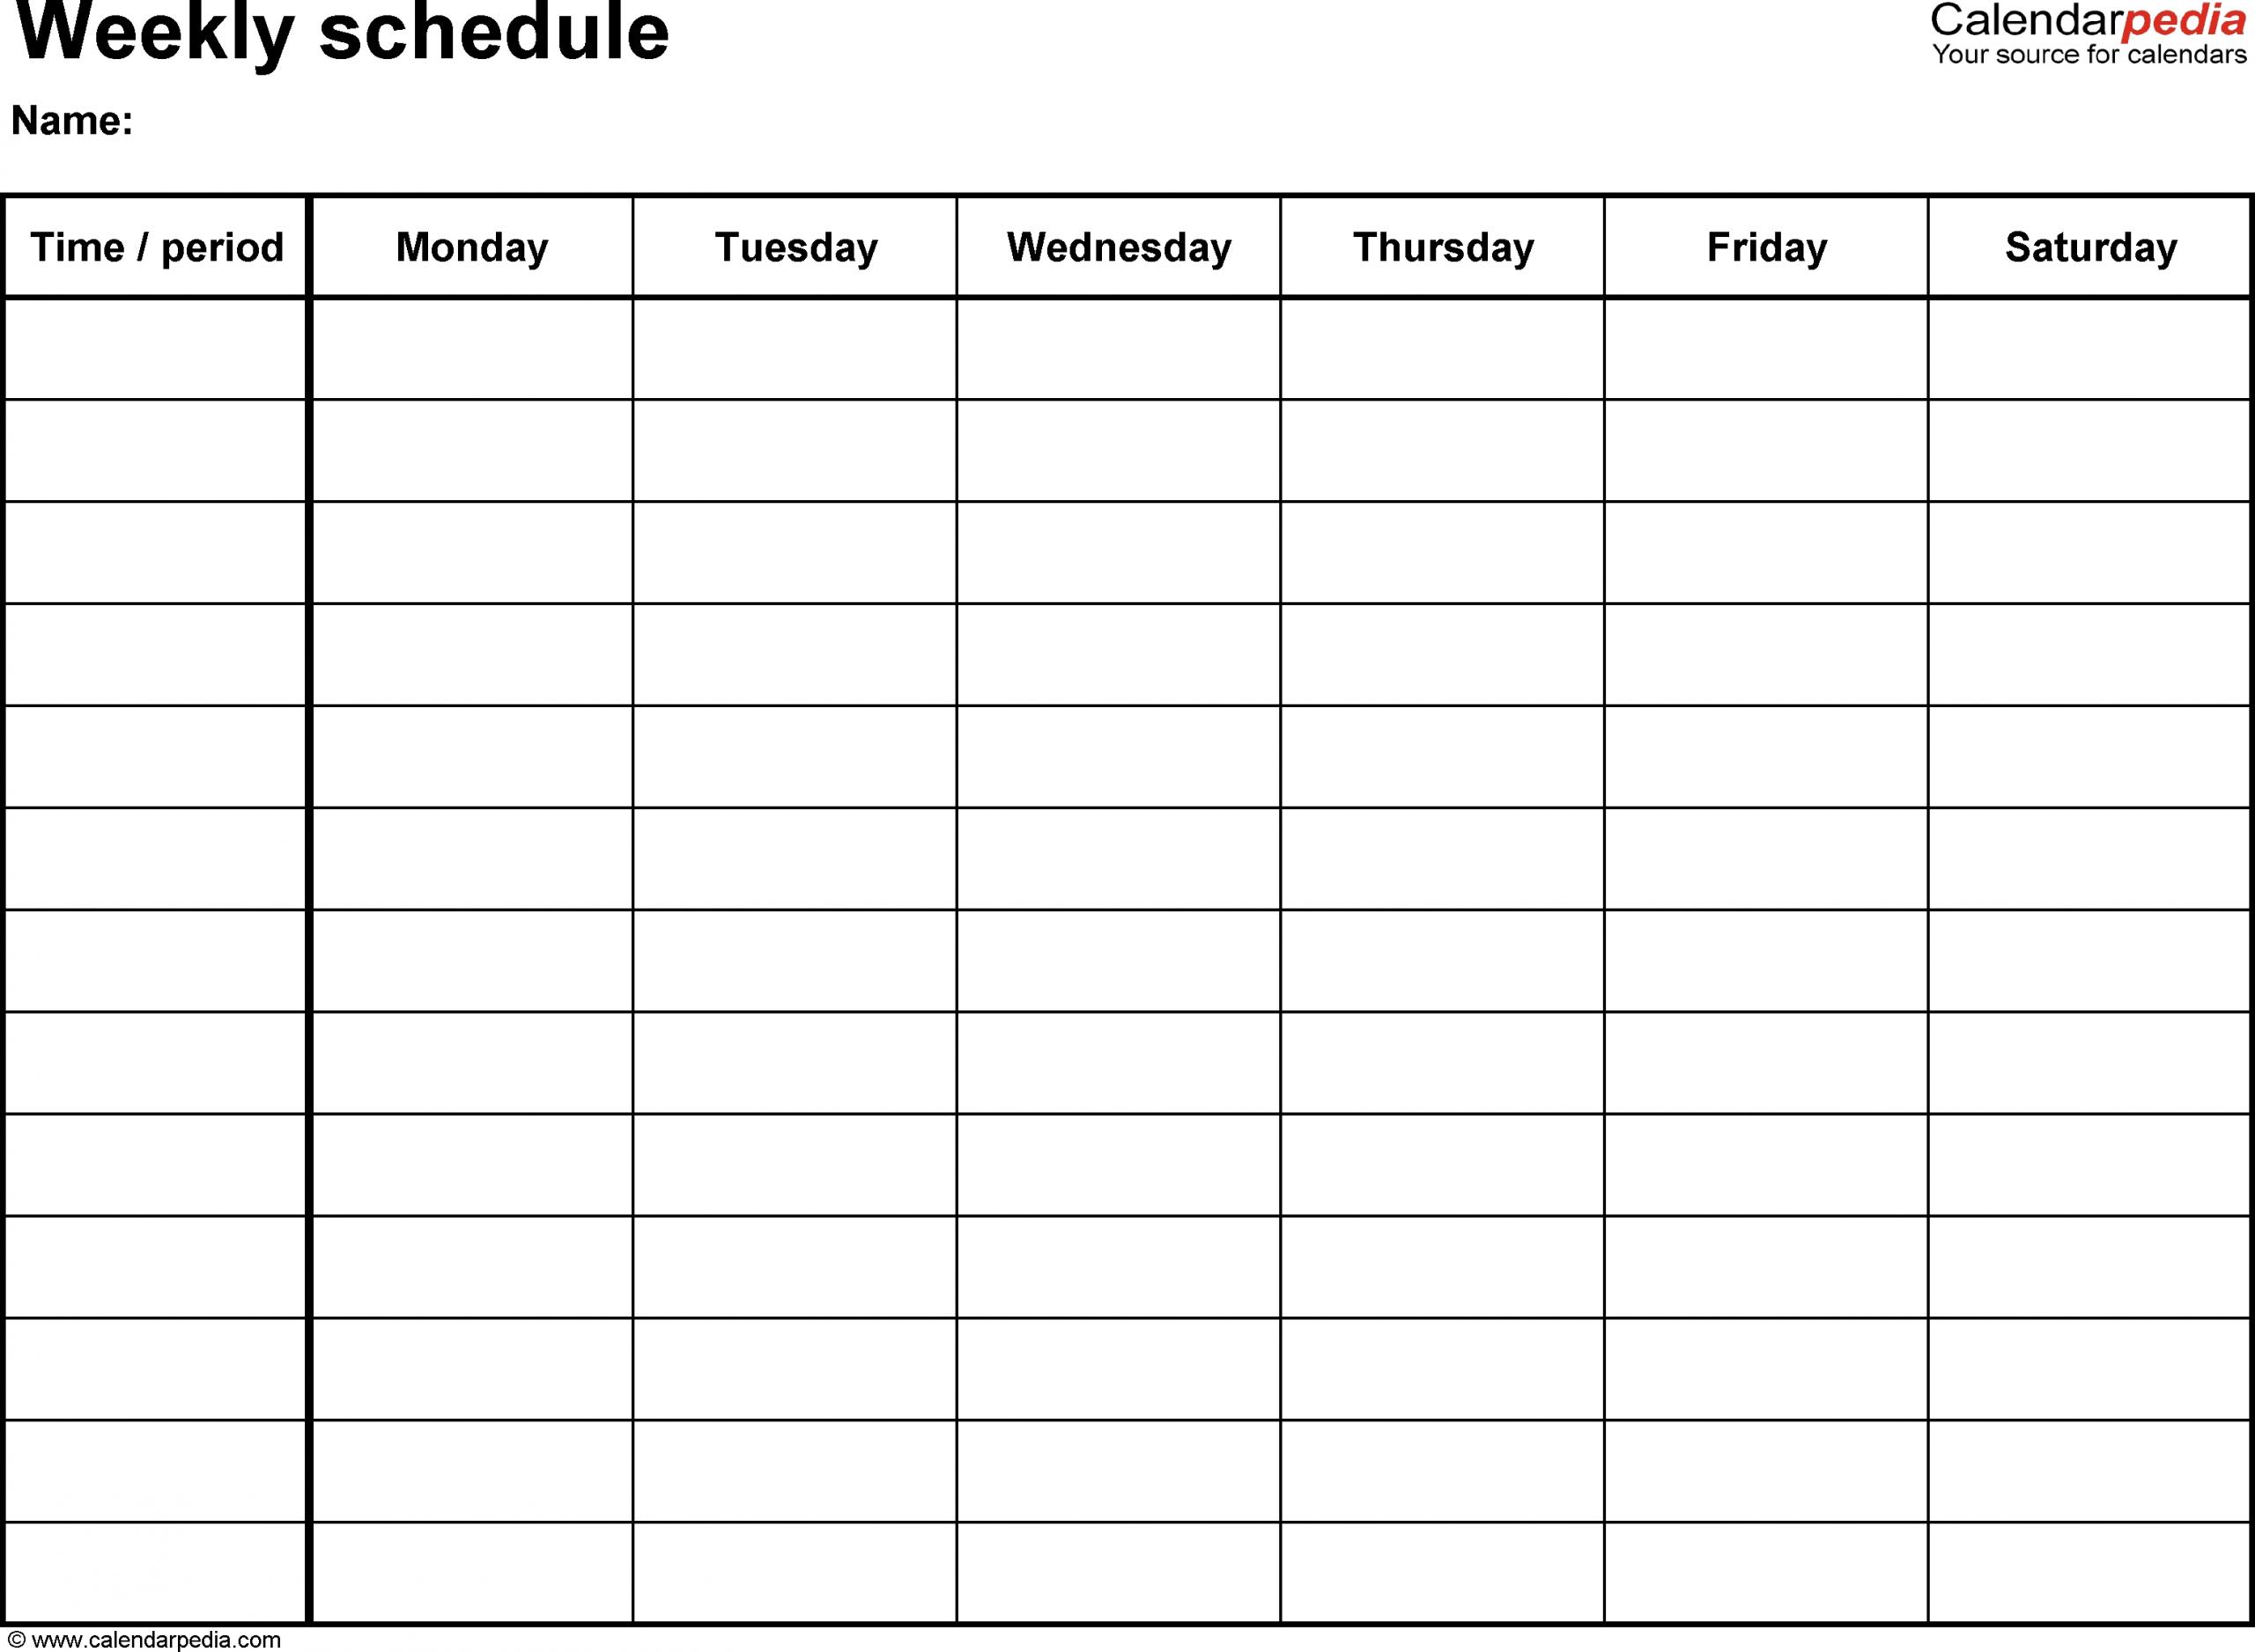 April 2019 - Page 2 - Template Calendar Design Blank Printable 8 Week Schedule